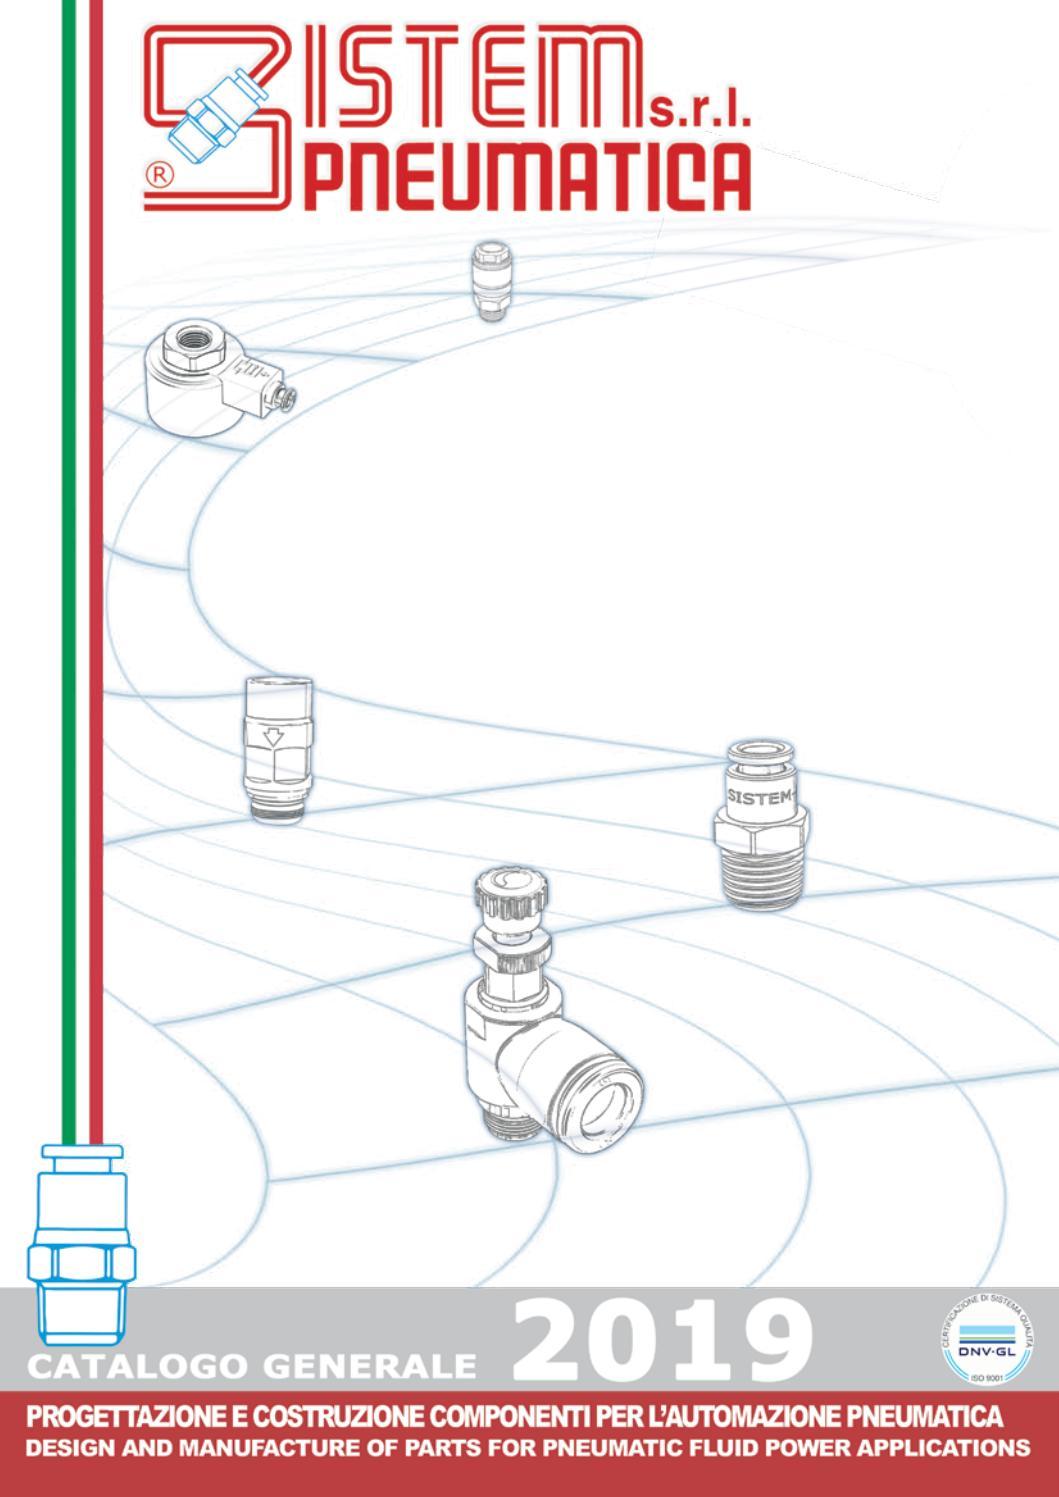 NYLON PNEUMATICO MASCHIO Stud RACCORDO METRICA /& BSP Tubo Inline push fit Connettori